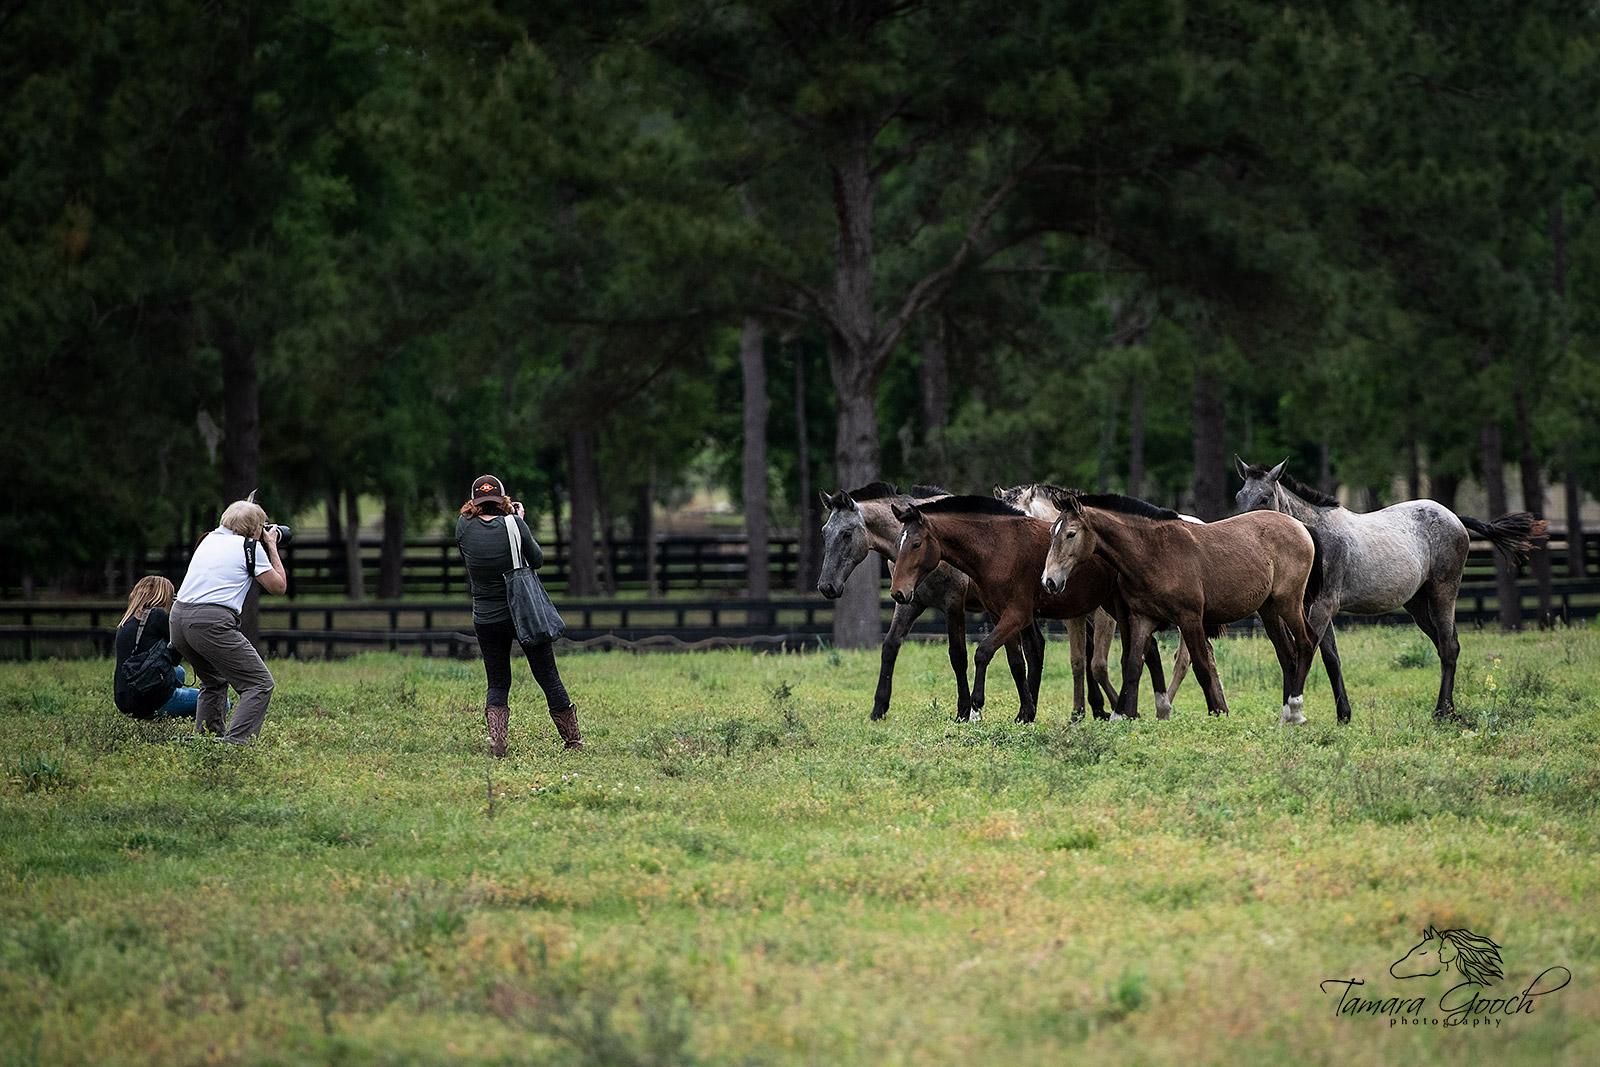 Equine Photography Workshop